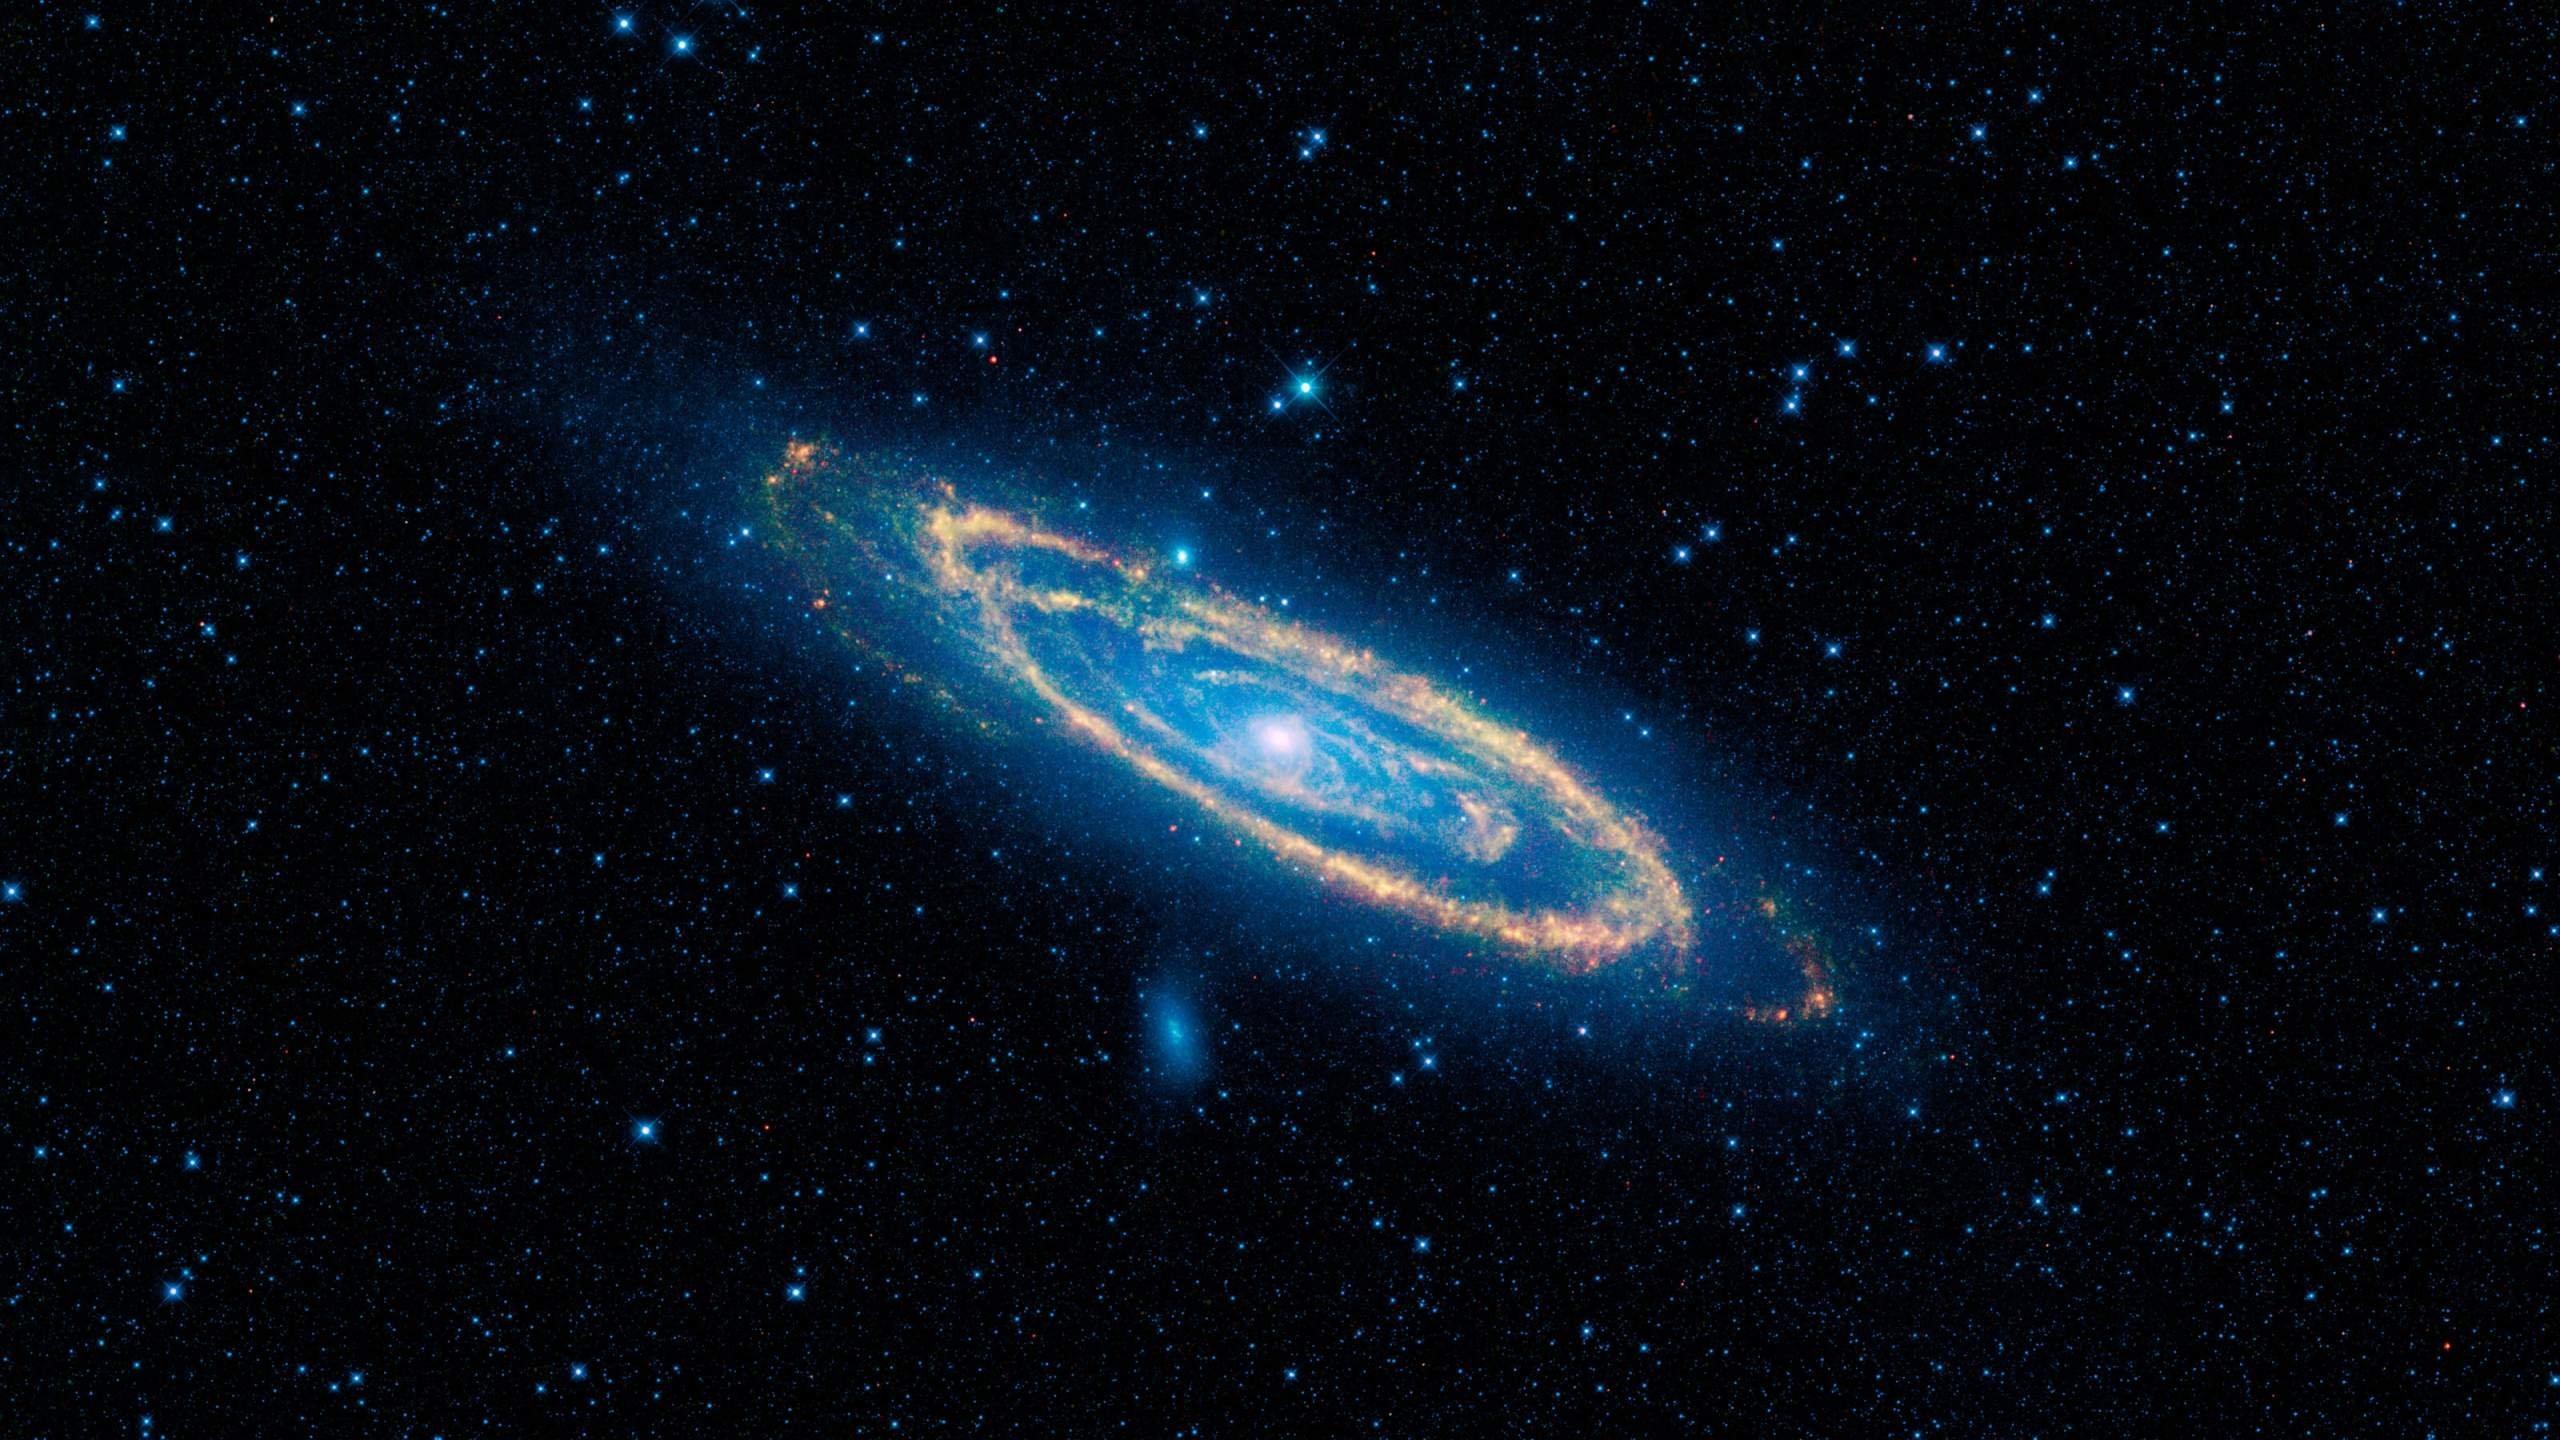 wallpaper.wiki-Cosmic-wallpaper-macbook-galaxy-display-retina-